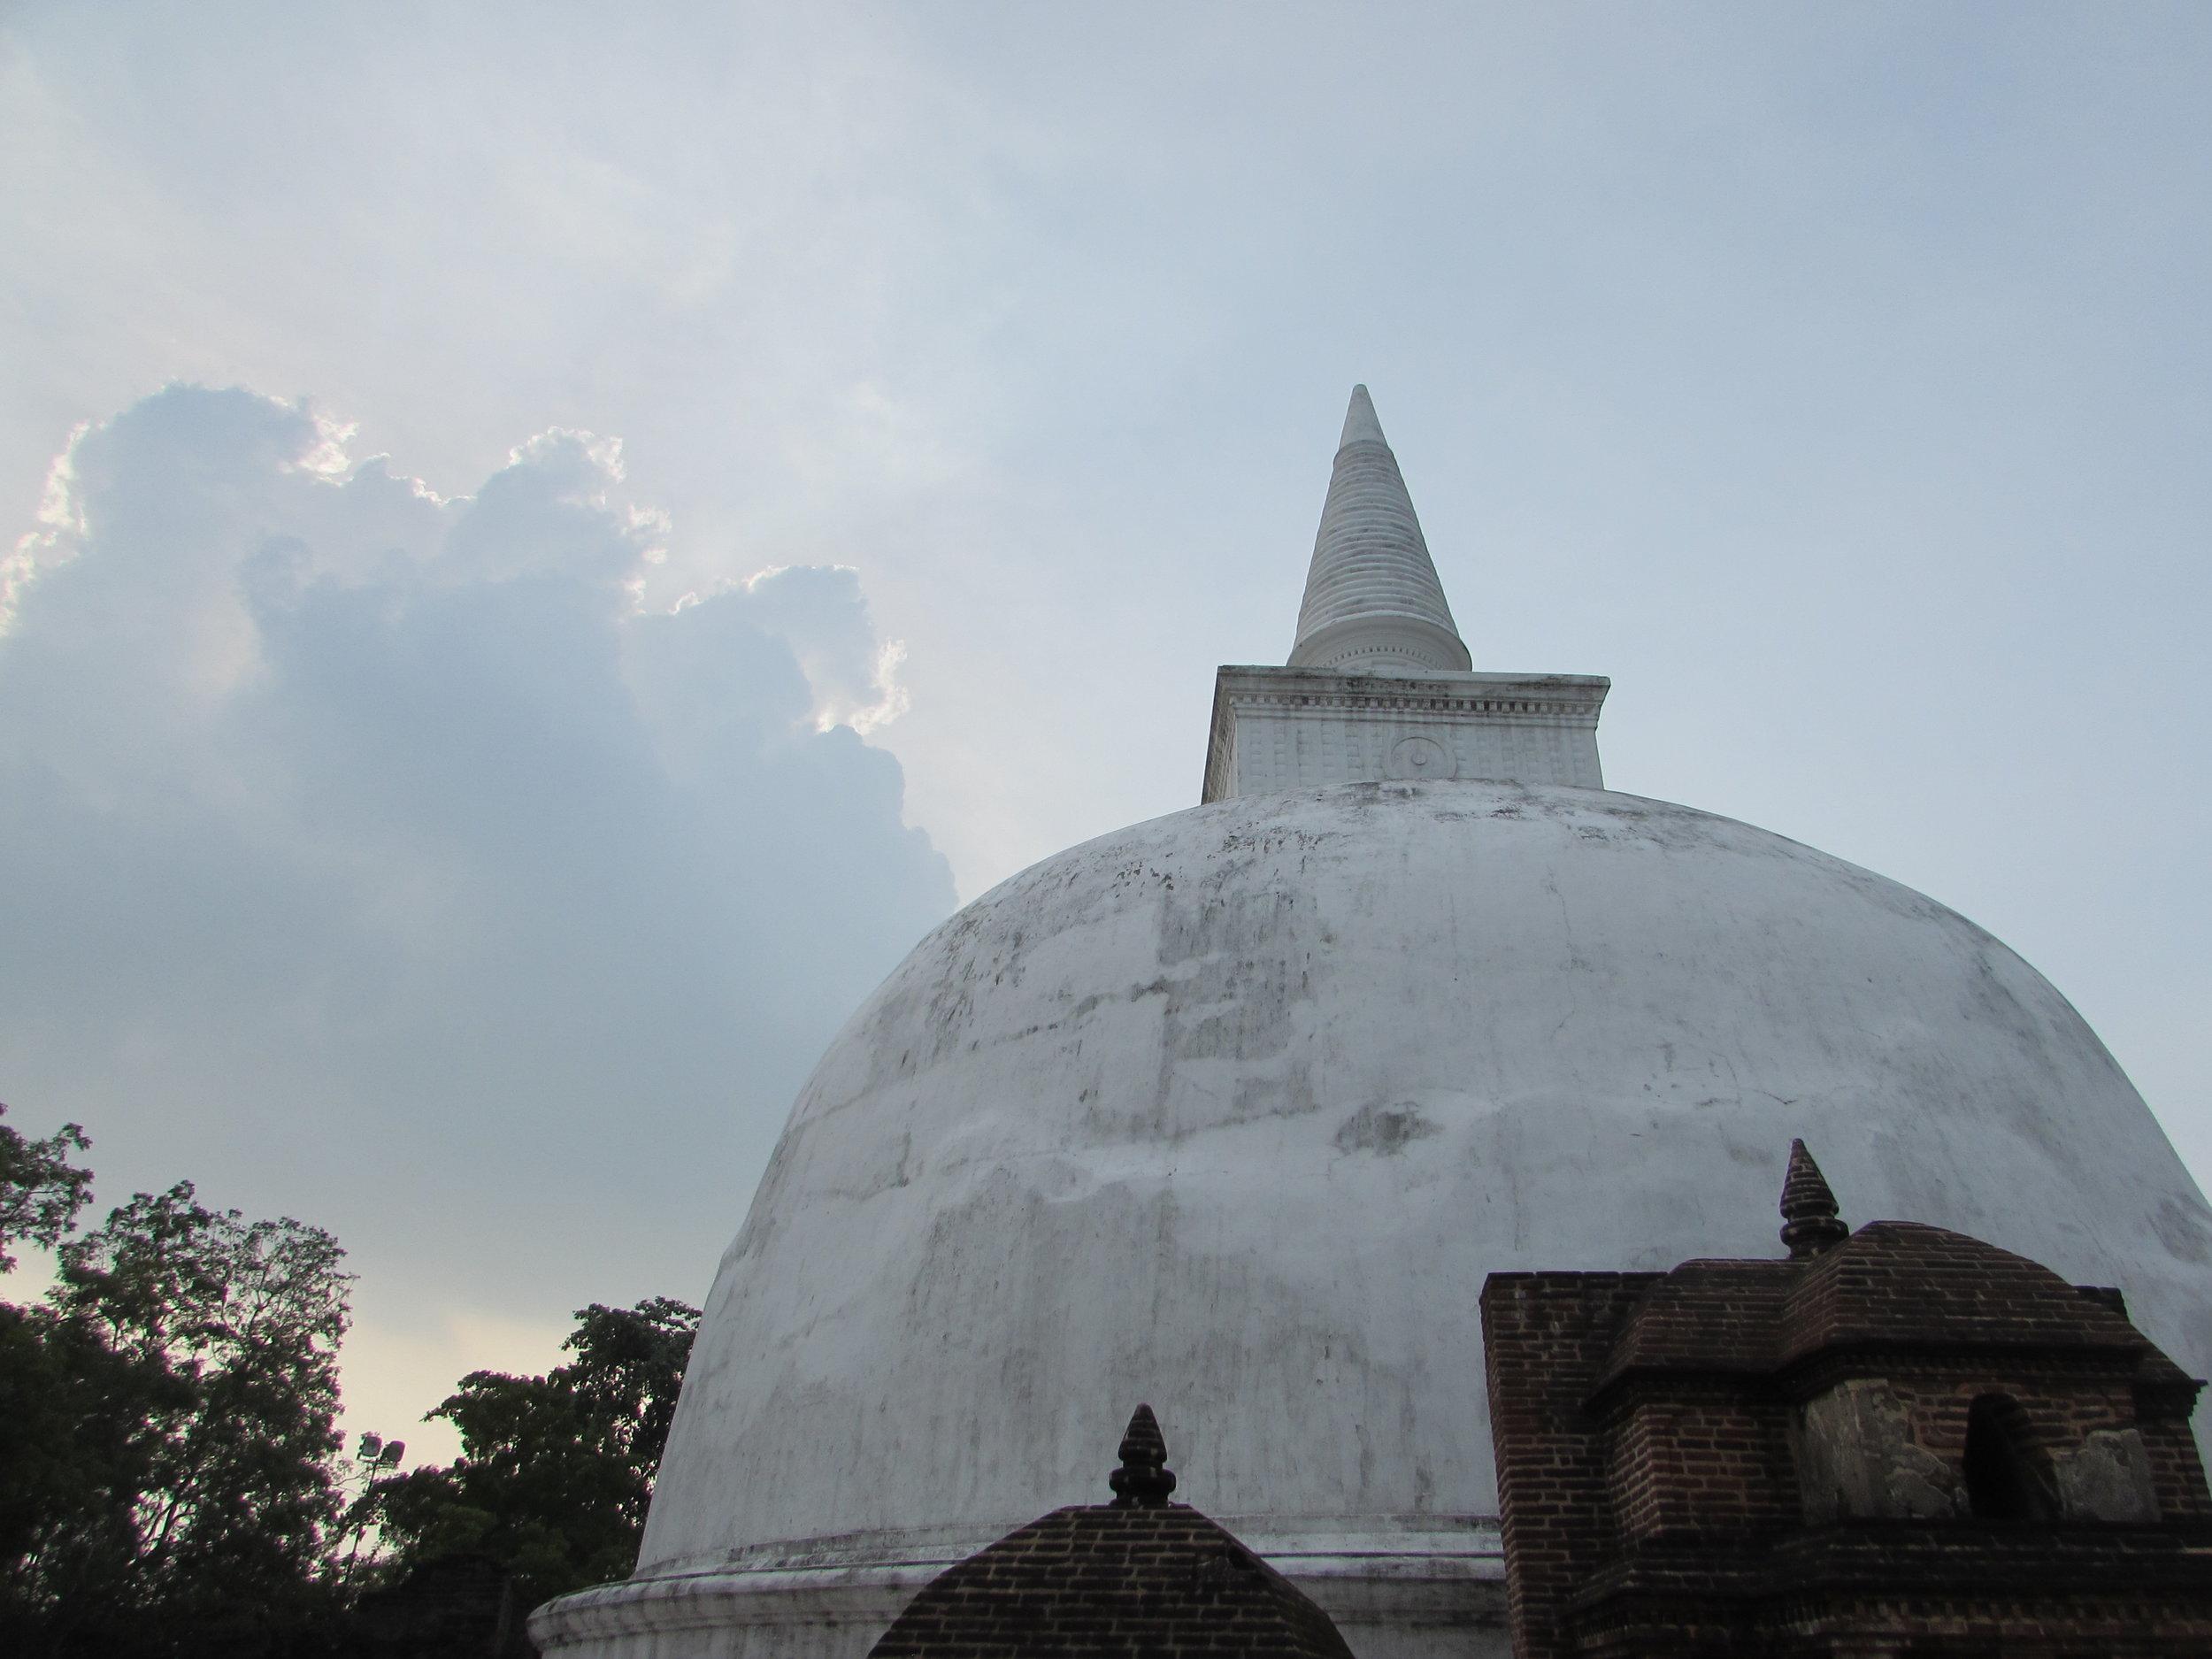 Stoopa at Polonnaruwa, captured by Jasmine Brand-Williamson